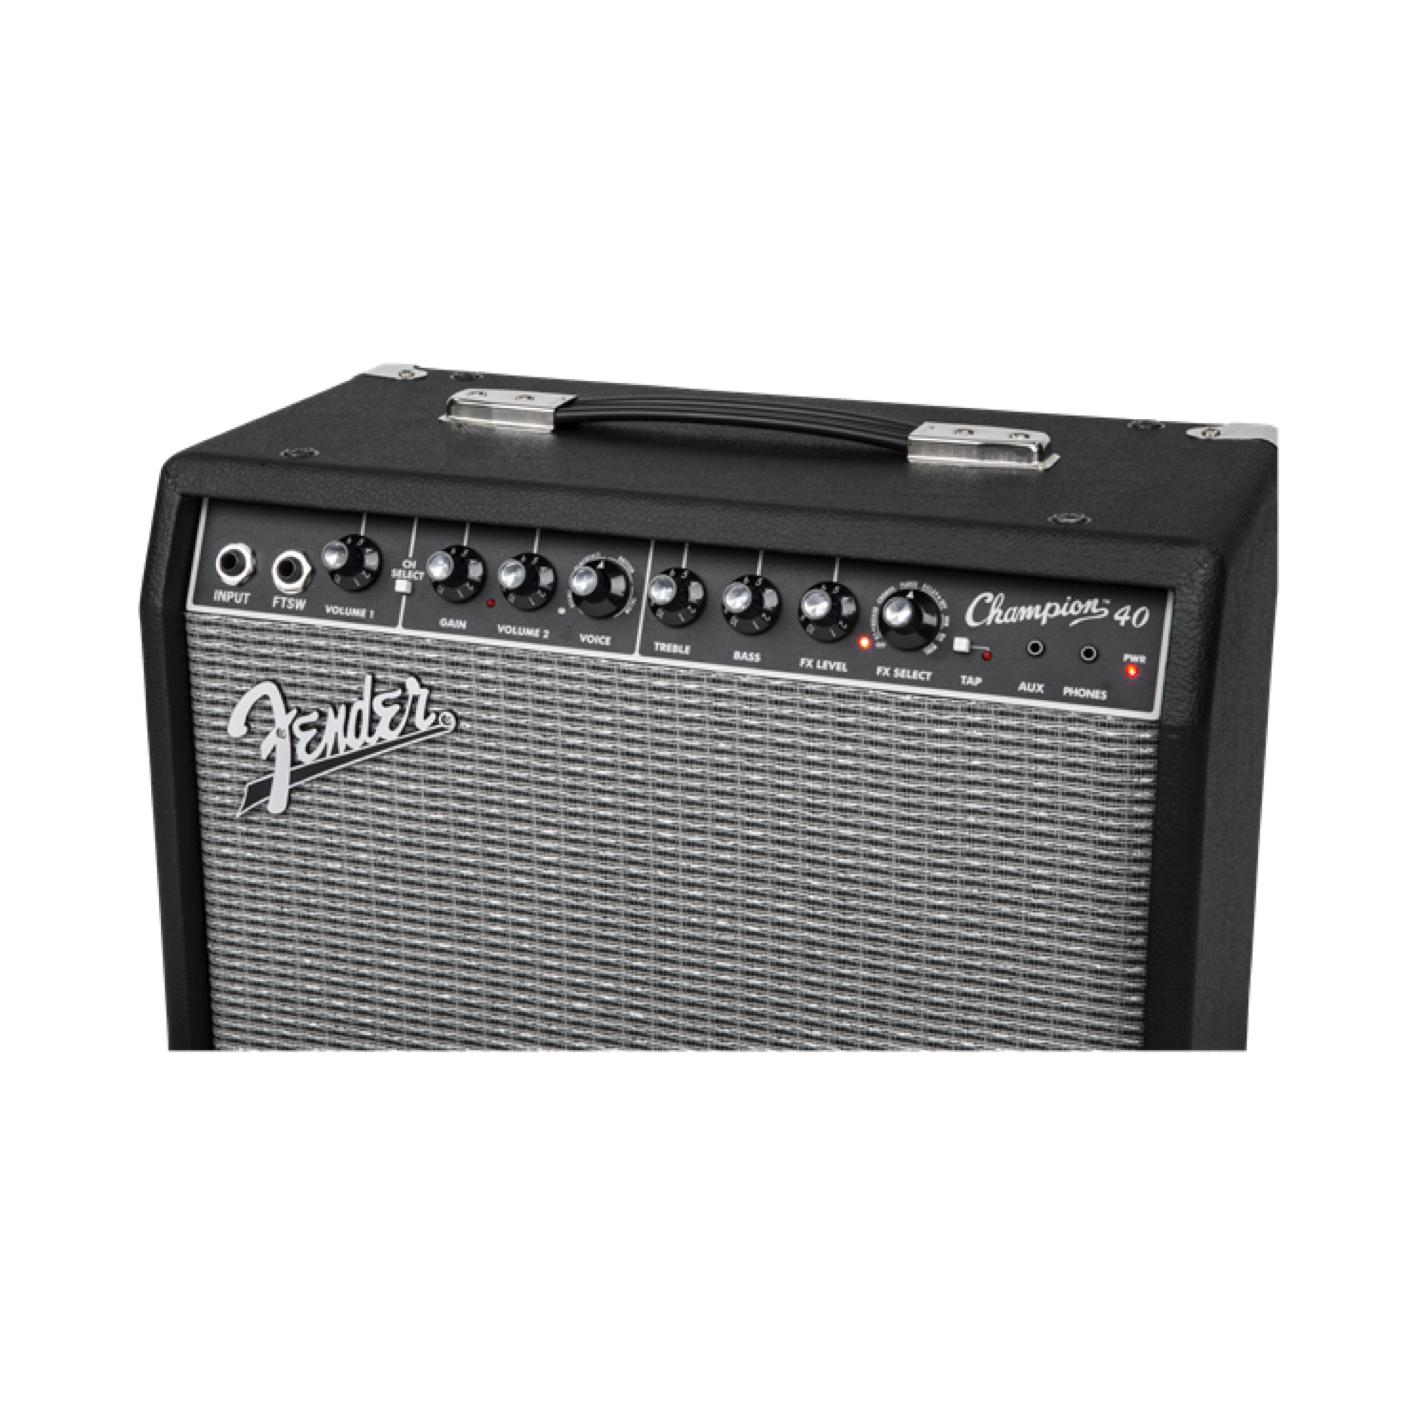 Fender Champ 40 40w Guitar Amp